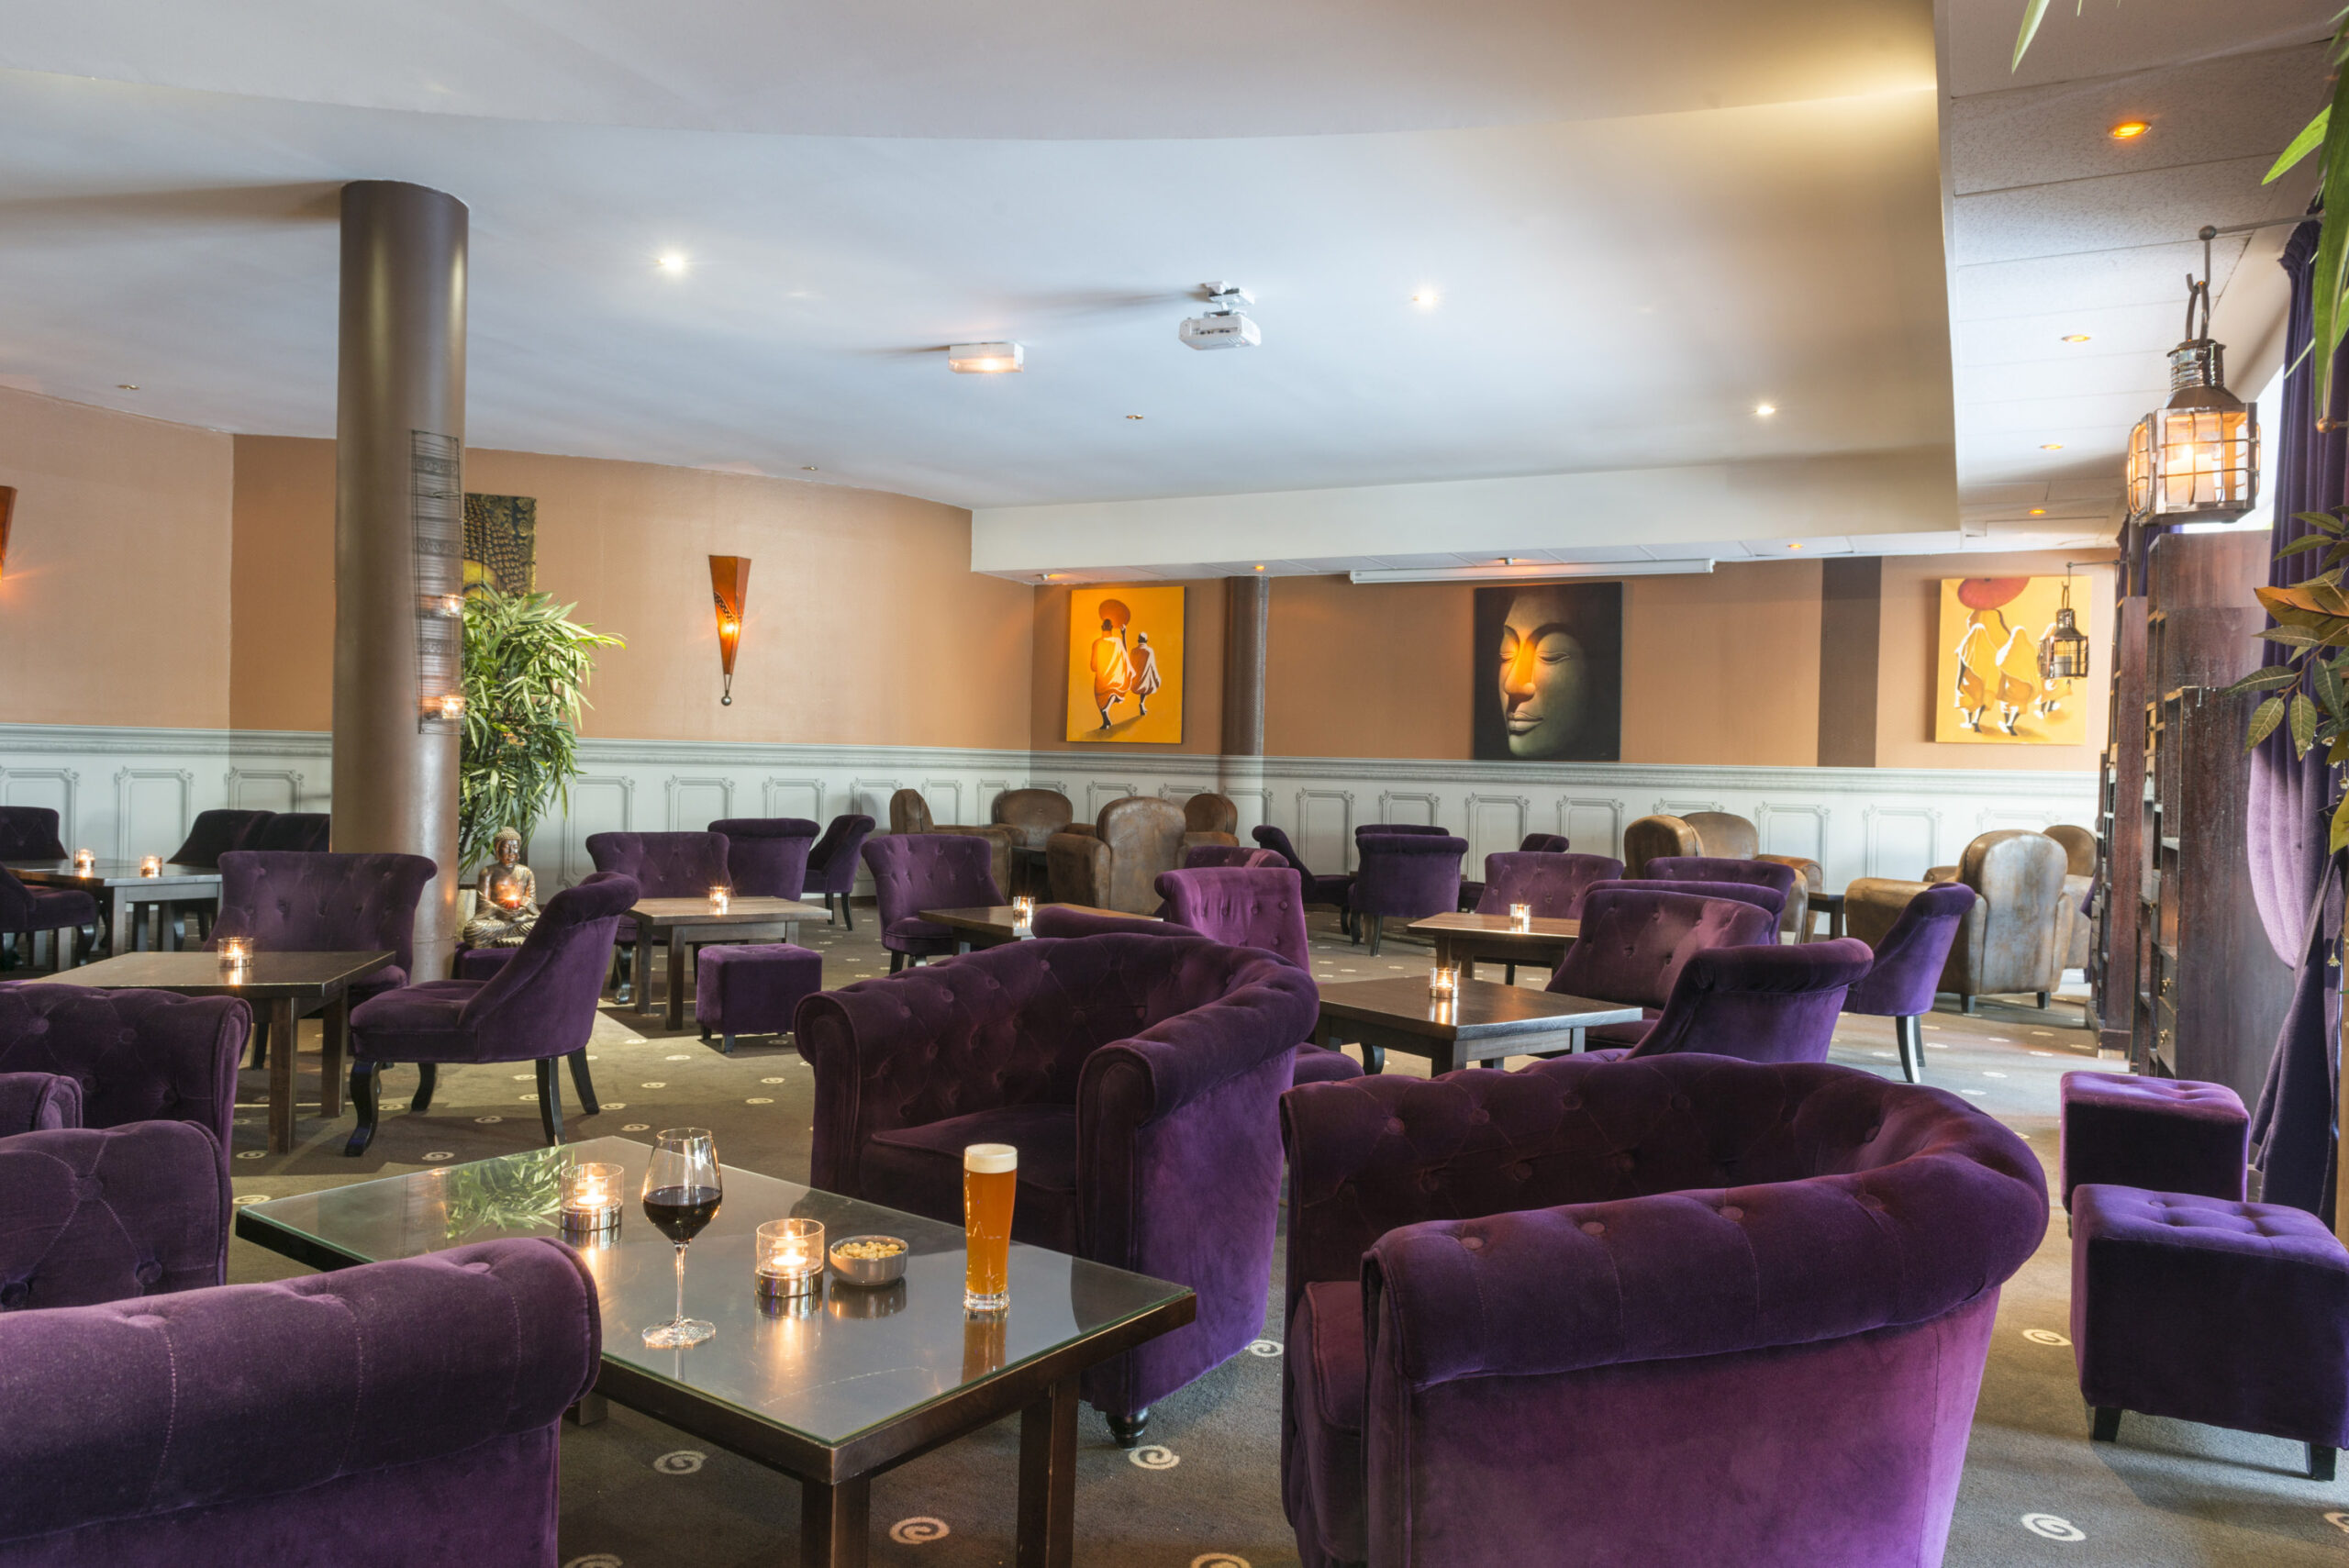 Vue du bar - Hotel Alteora Chasseneuil-du-Poitou